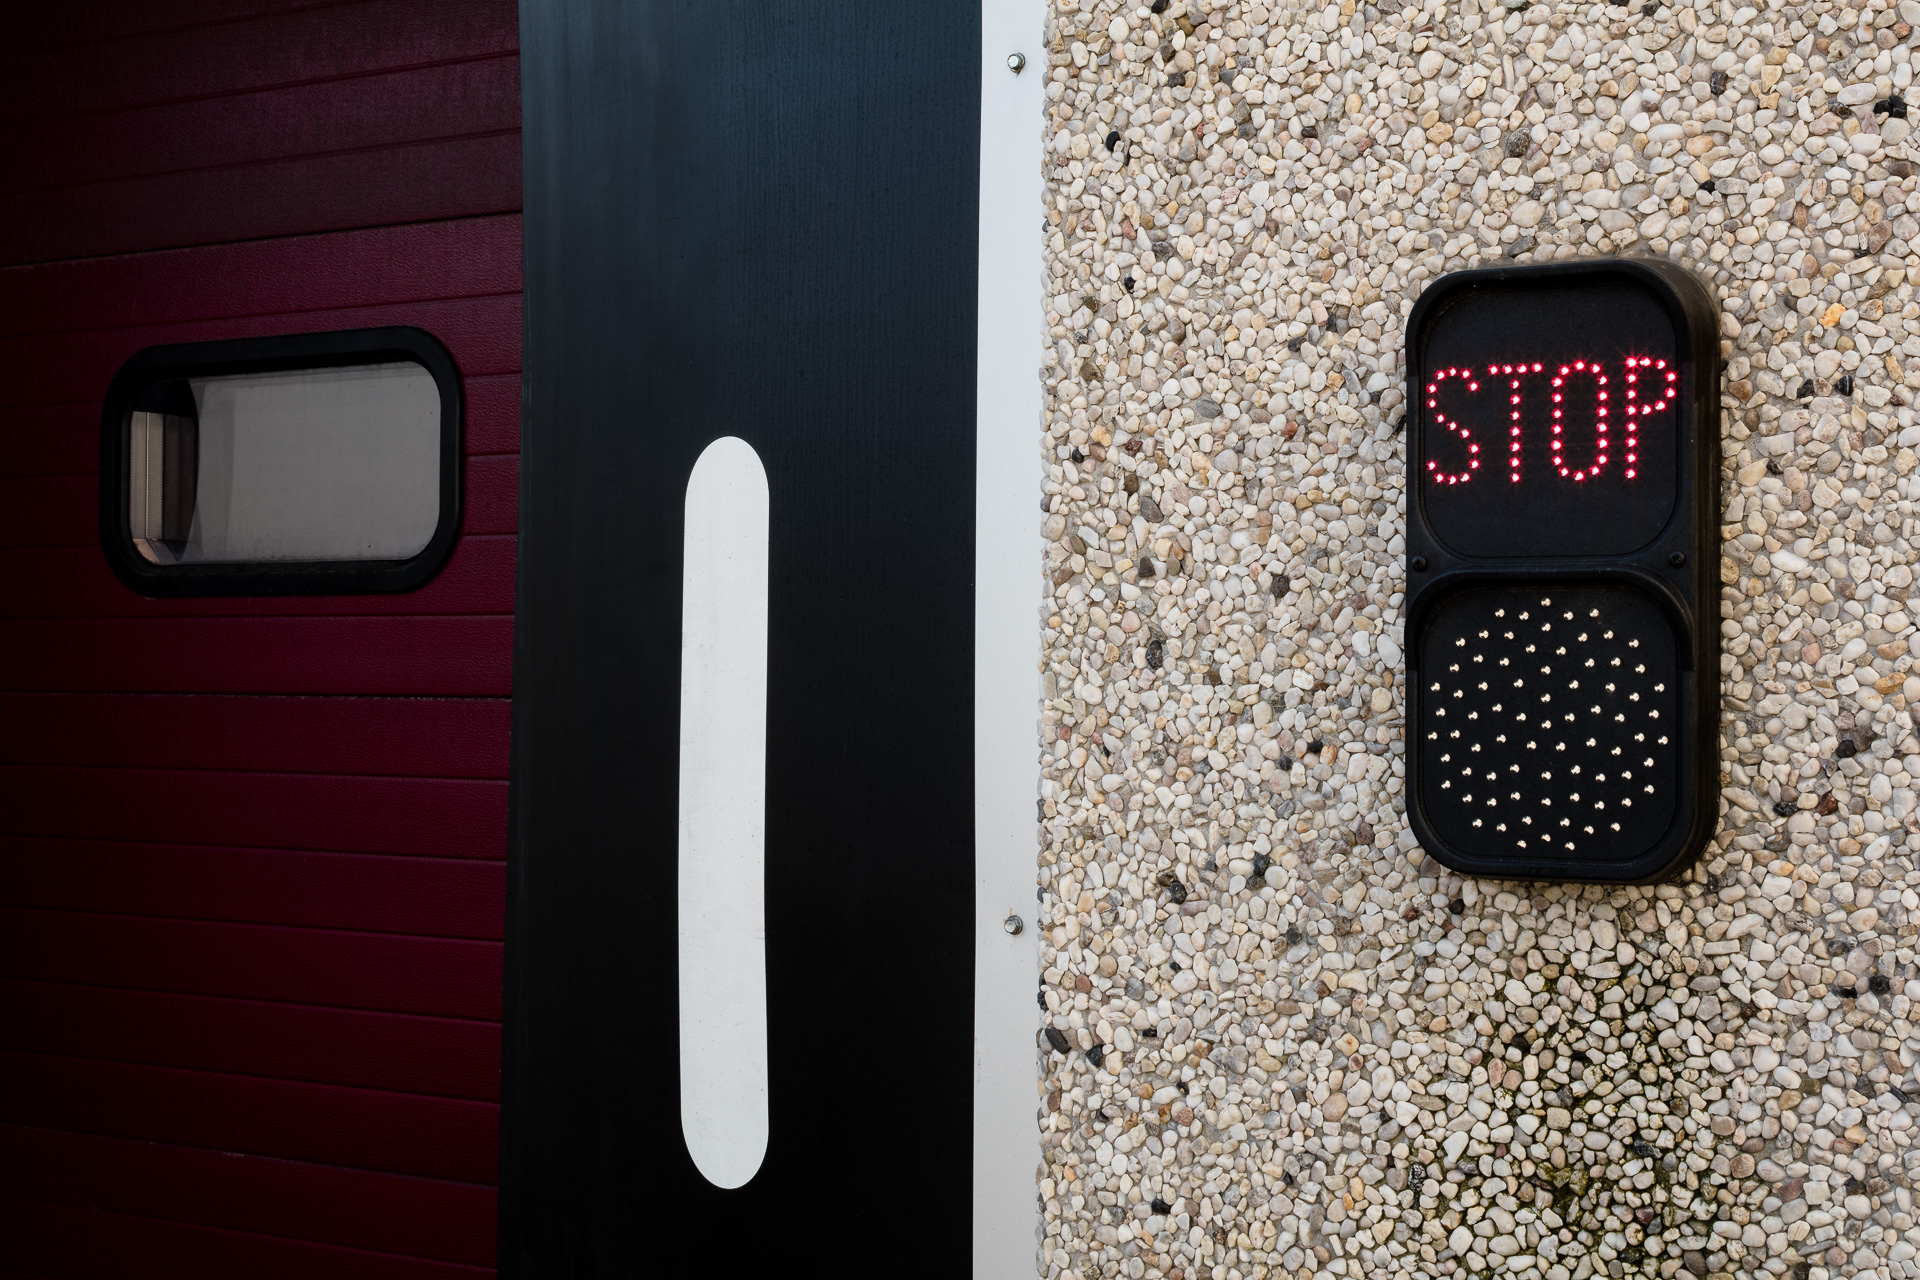 interieurfotografie-dtonic-electro-verbeke-full-063